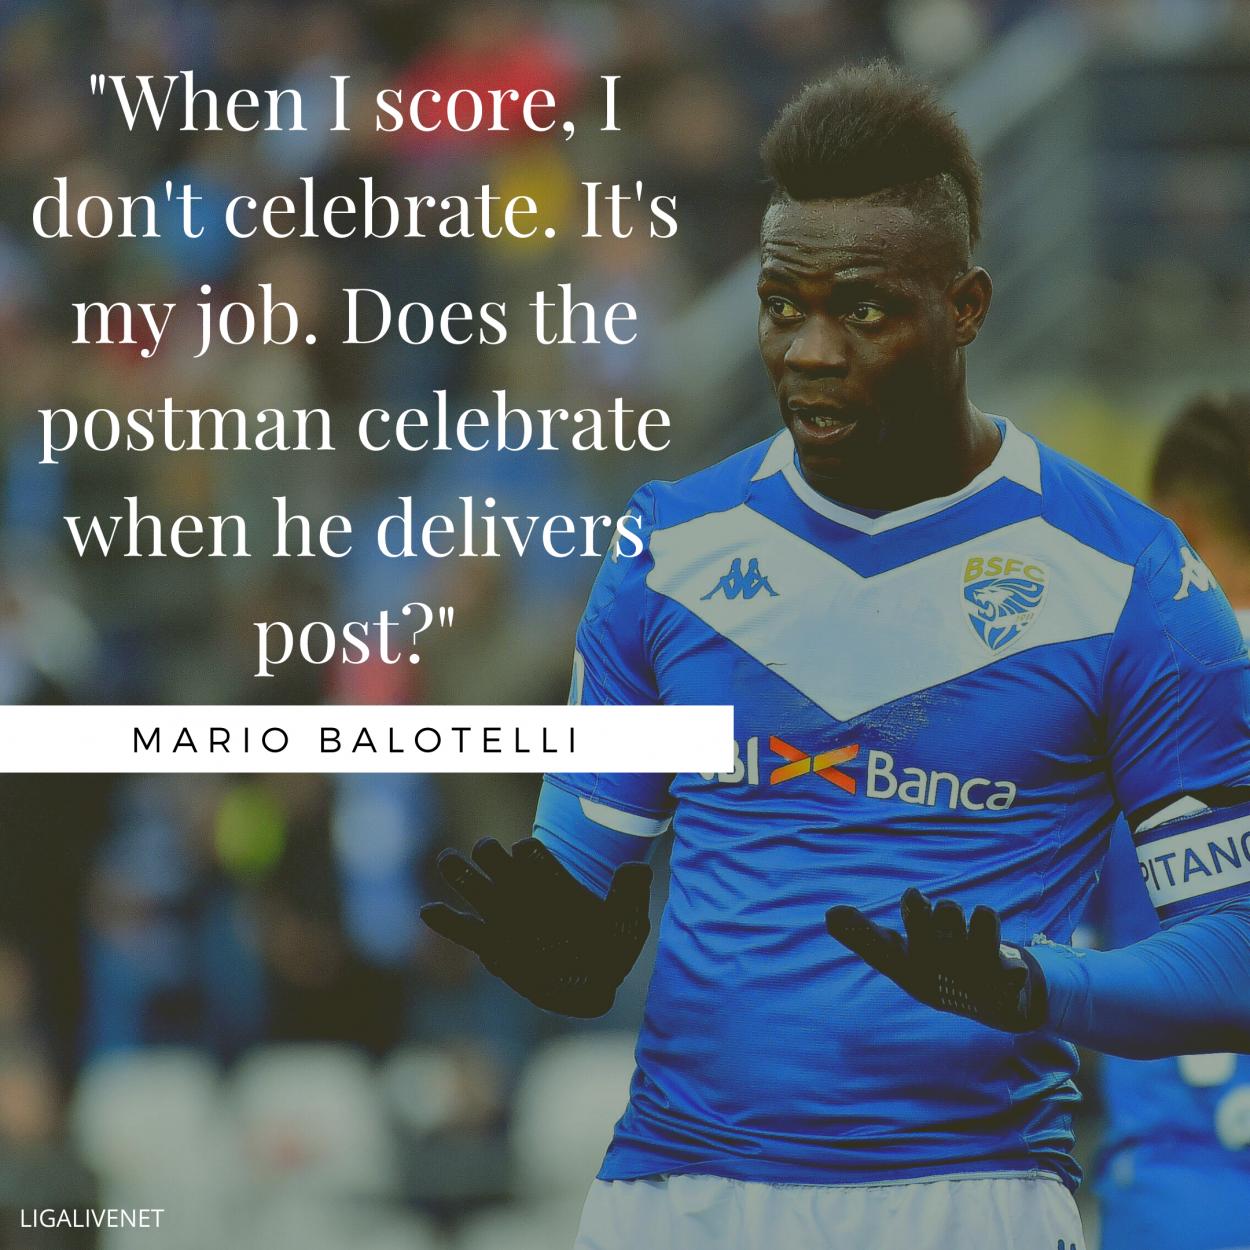 Balotelli quote